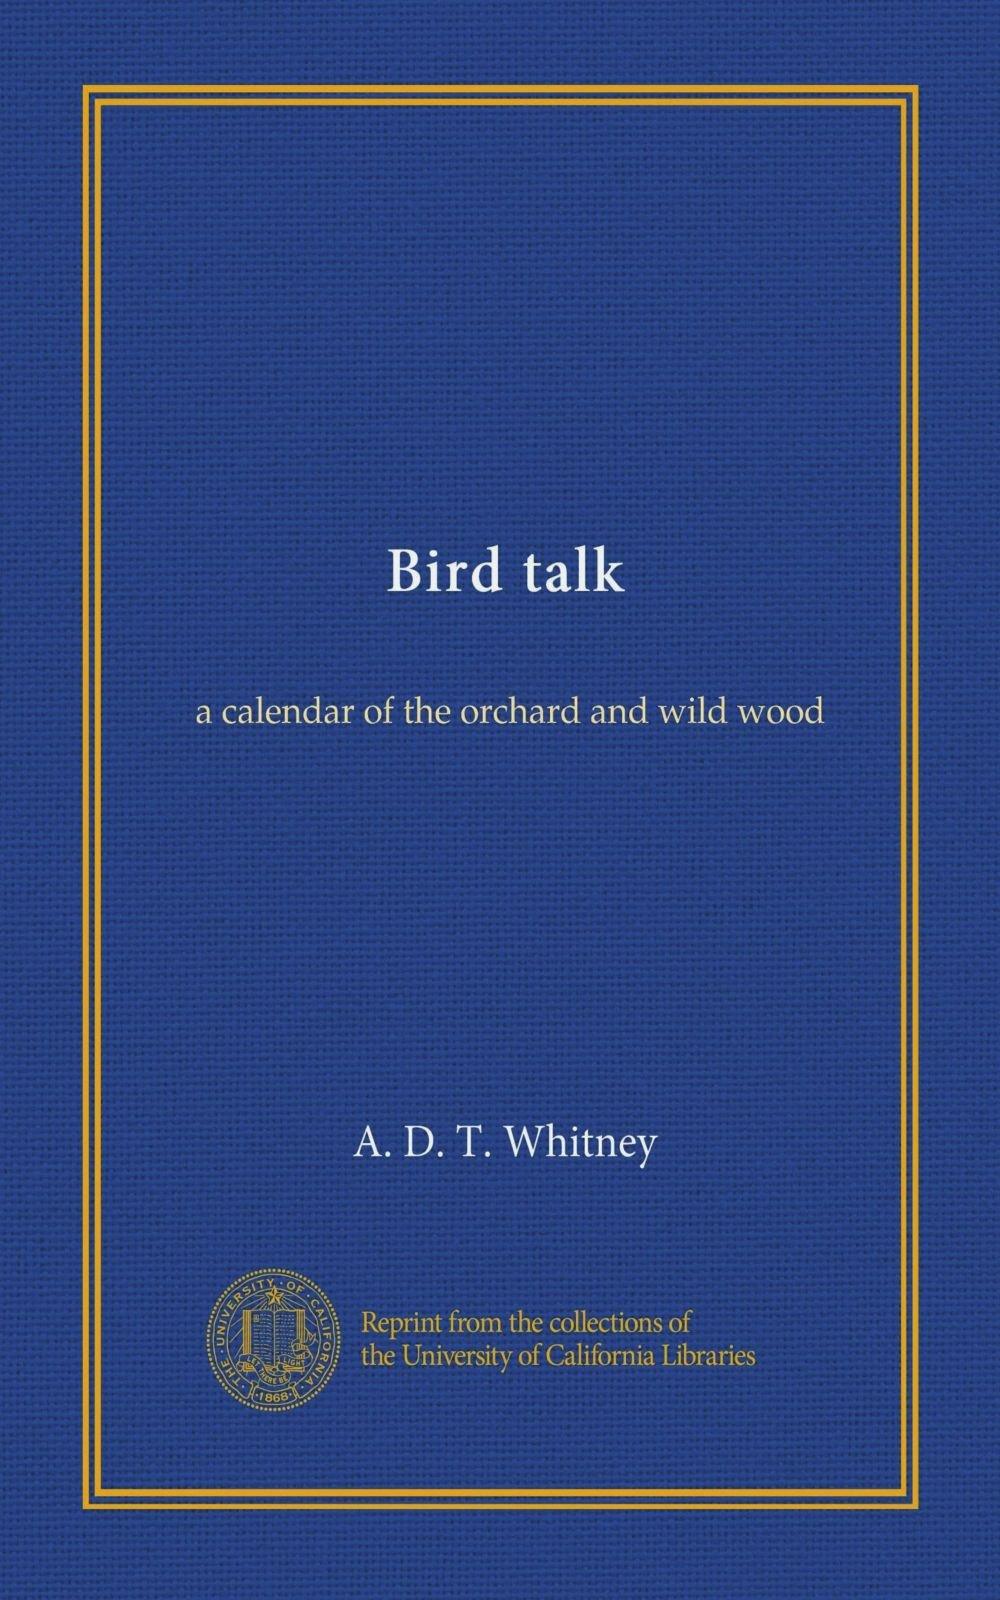 Bird talk: a calendar of the orchard and wild wood ebook